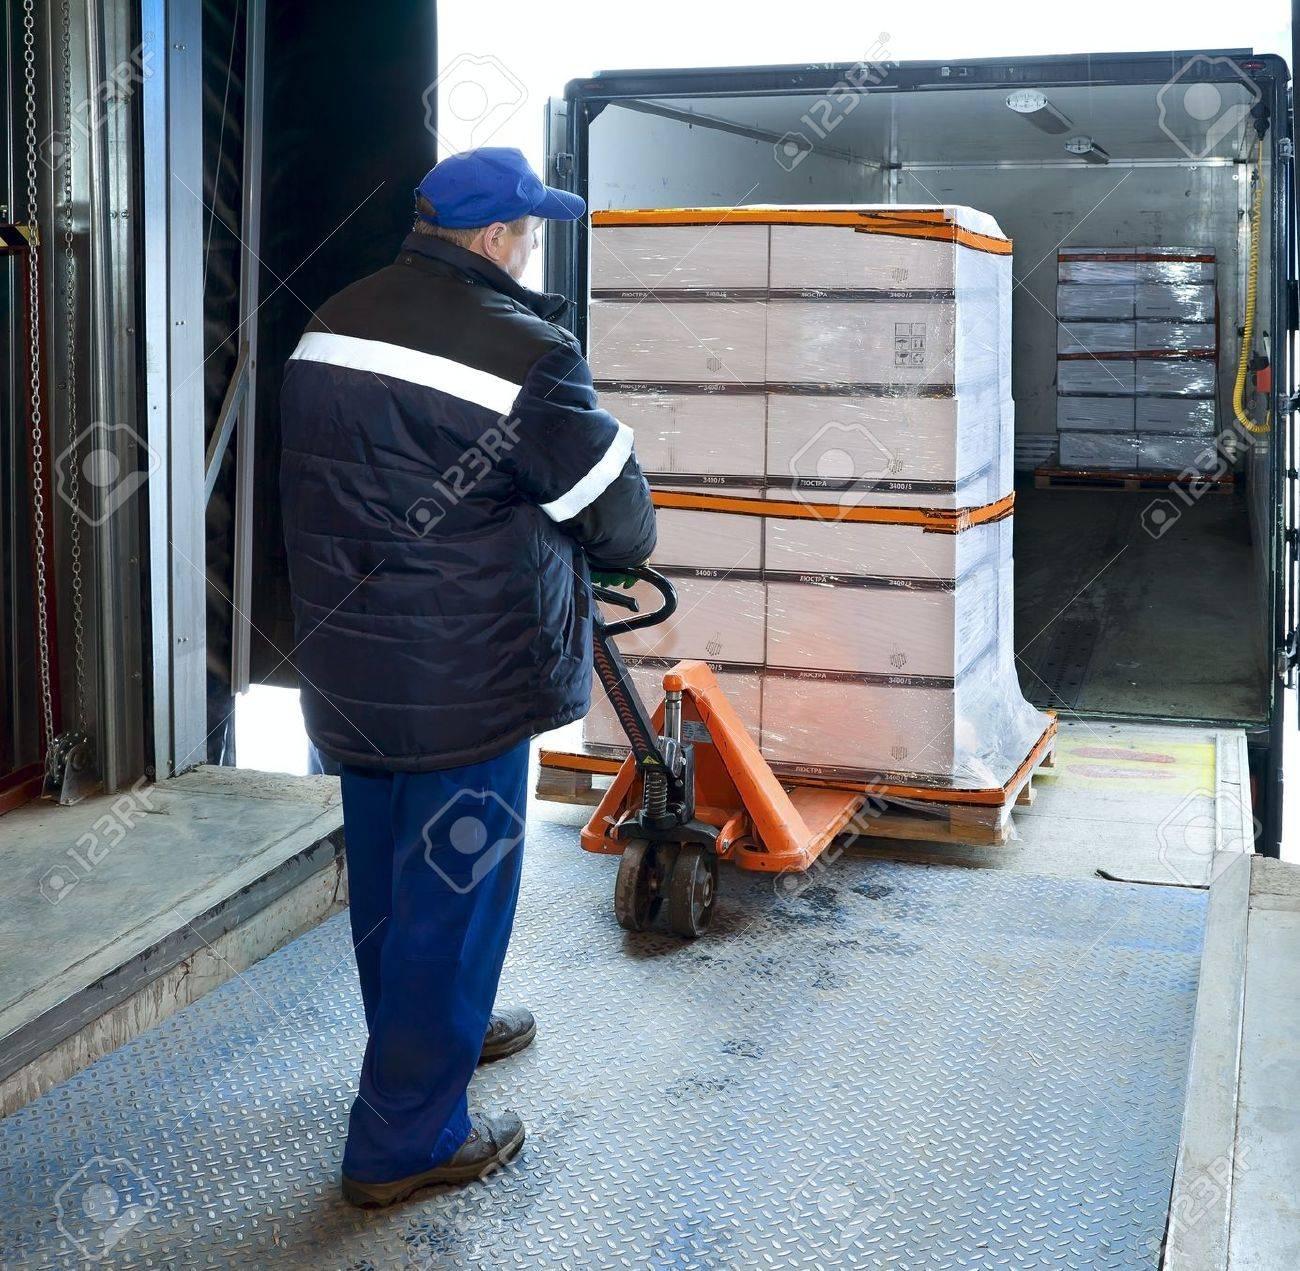 Worker loading truck on forklift Stock Photo - 19671548